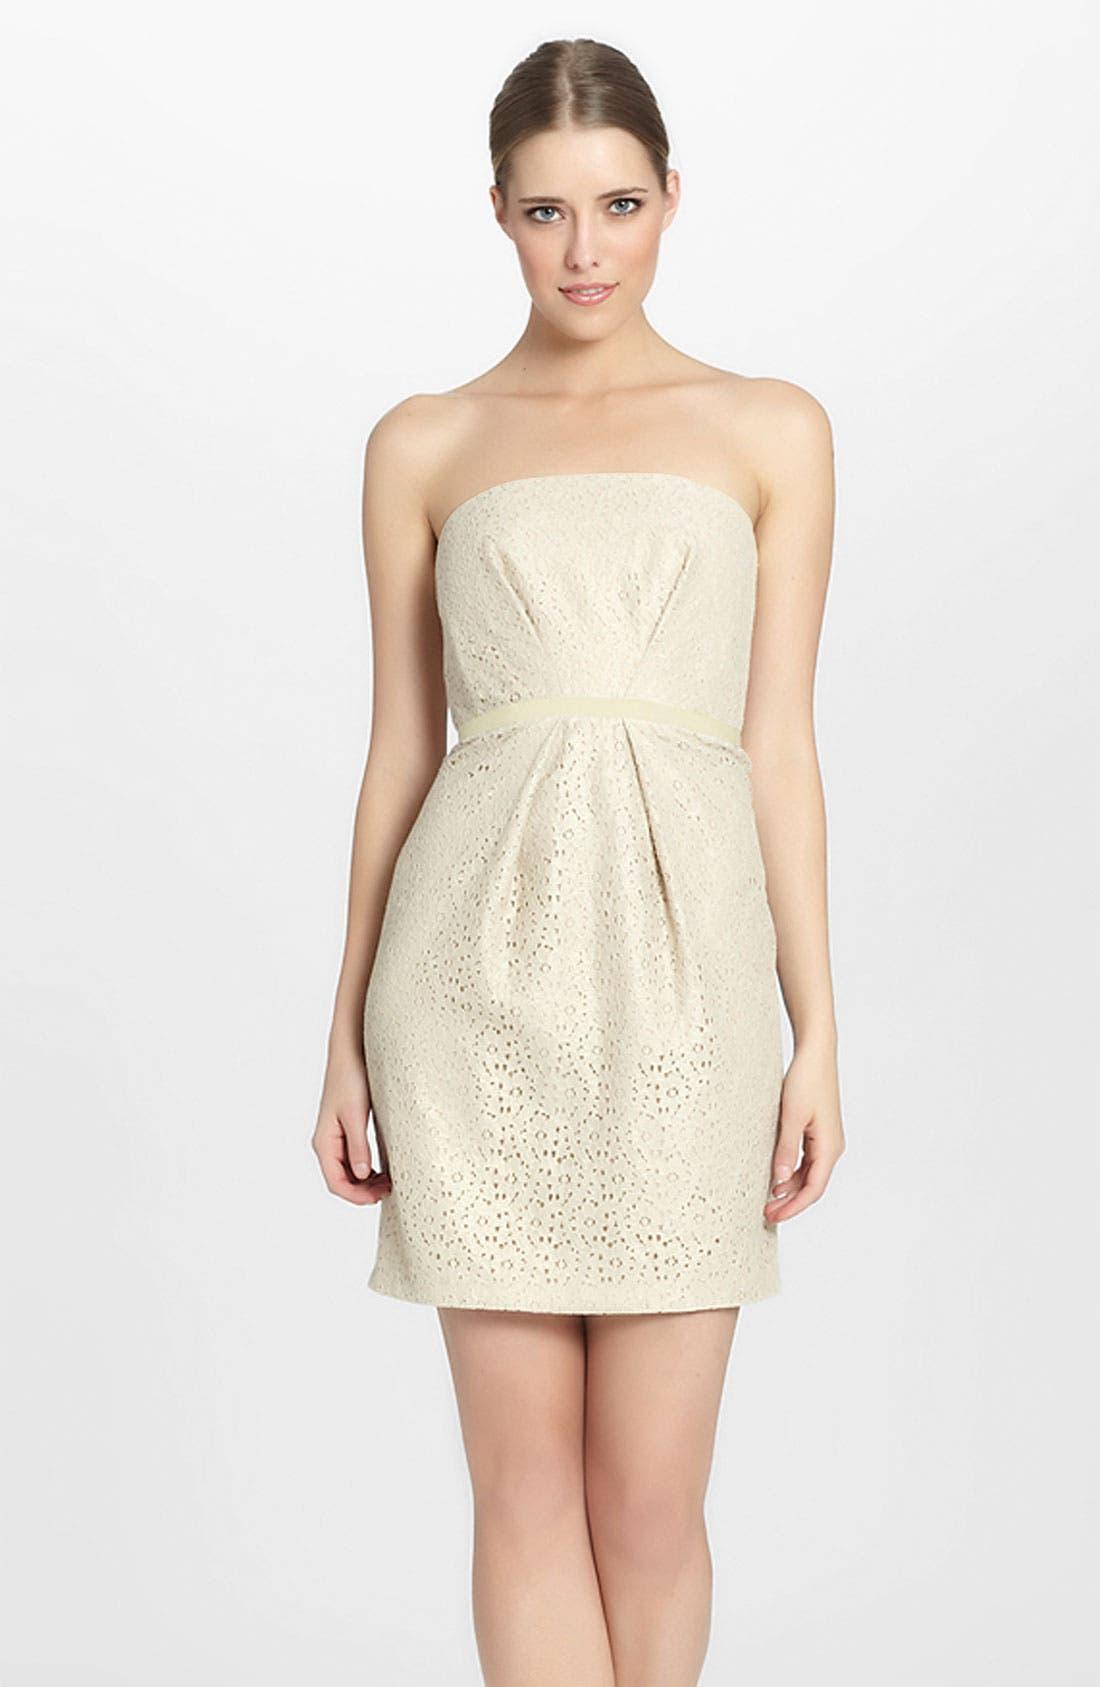 Alternate Image 1 Selected - Seamline Cynthia Steffe 'Chloe' Foiled Lace Sheath Dress